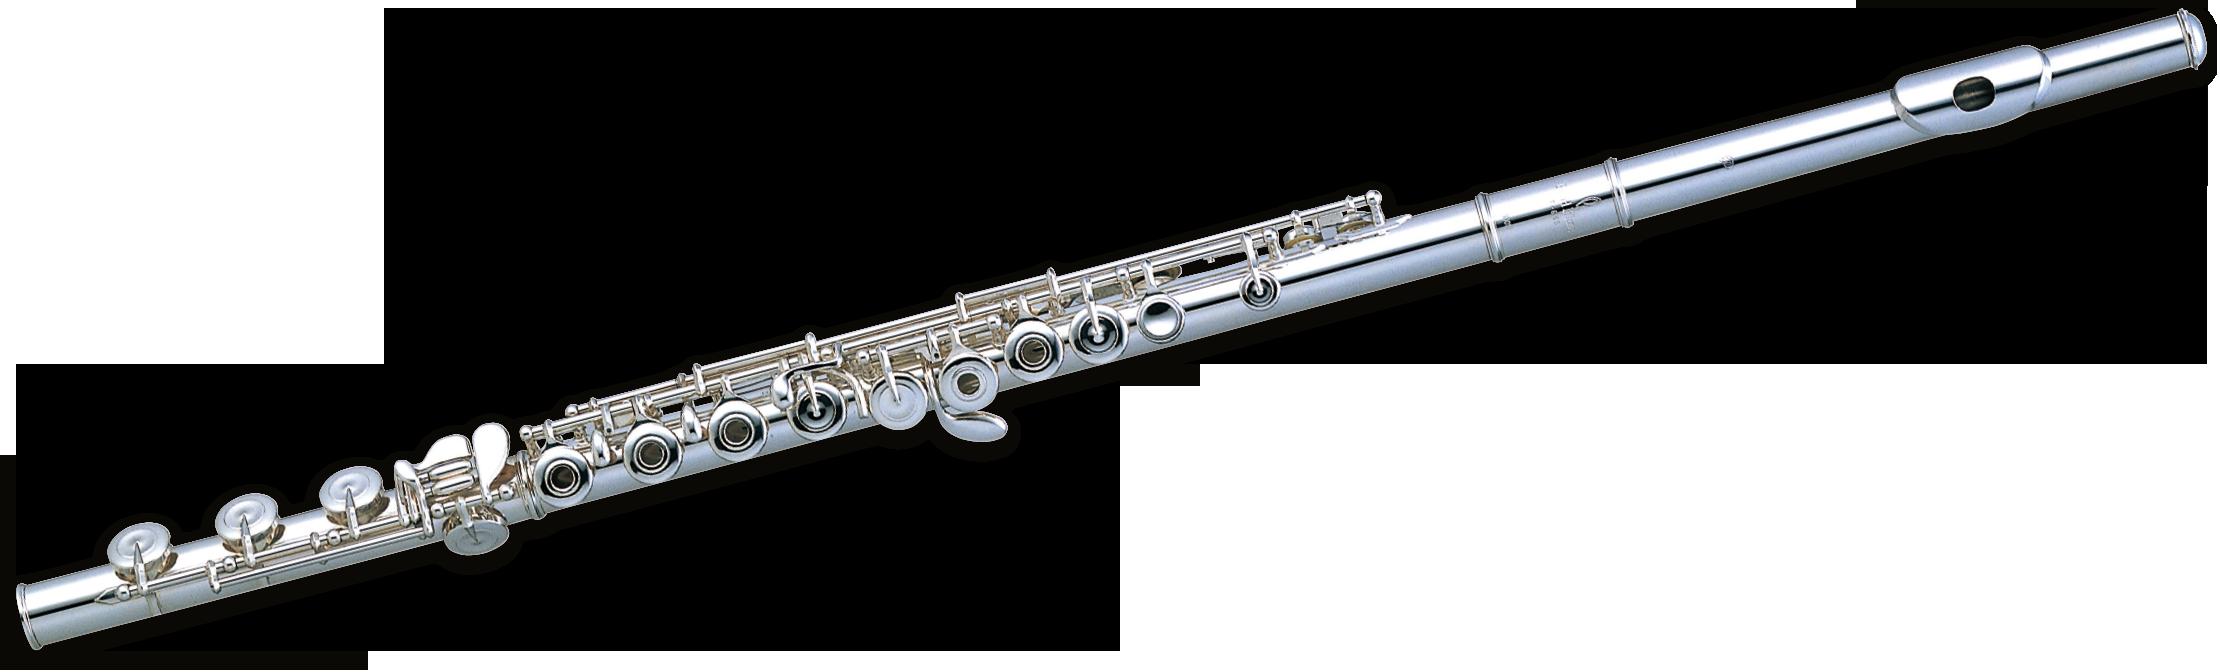 Flutes clipart piccolo. Western concert flute pearl